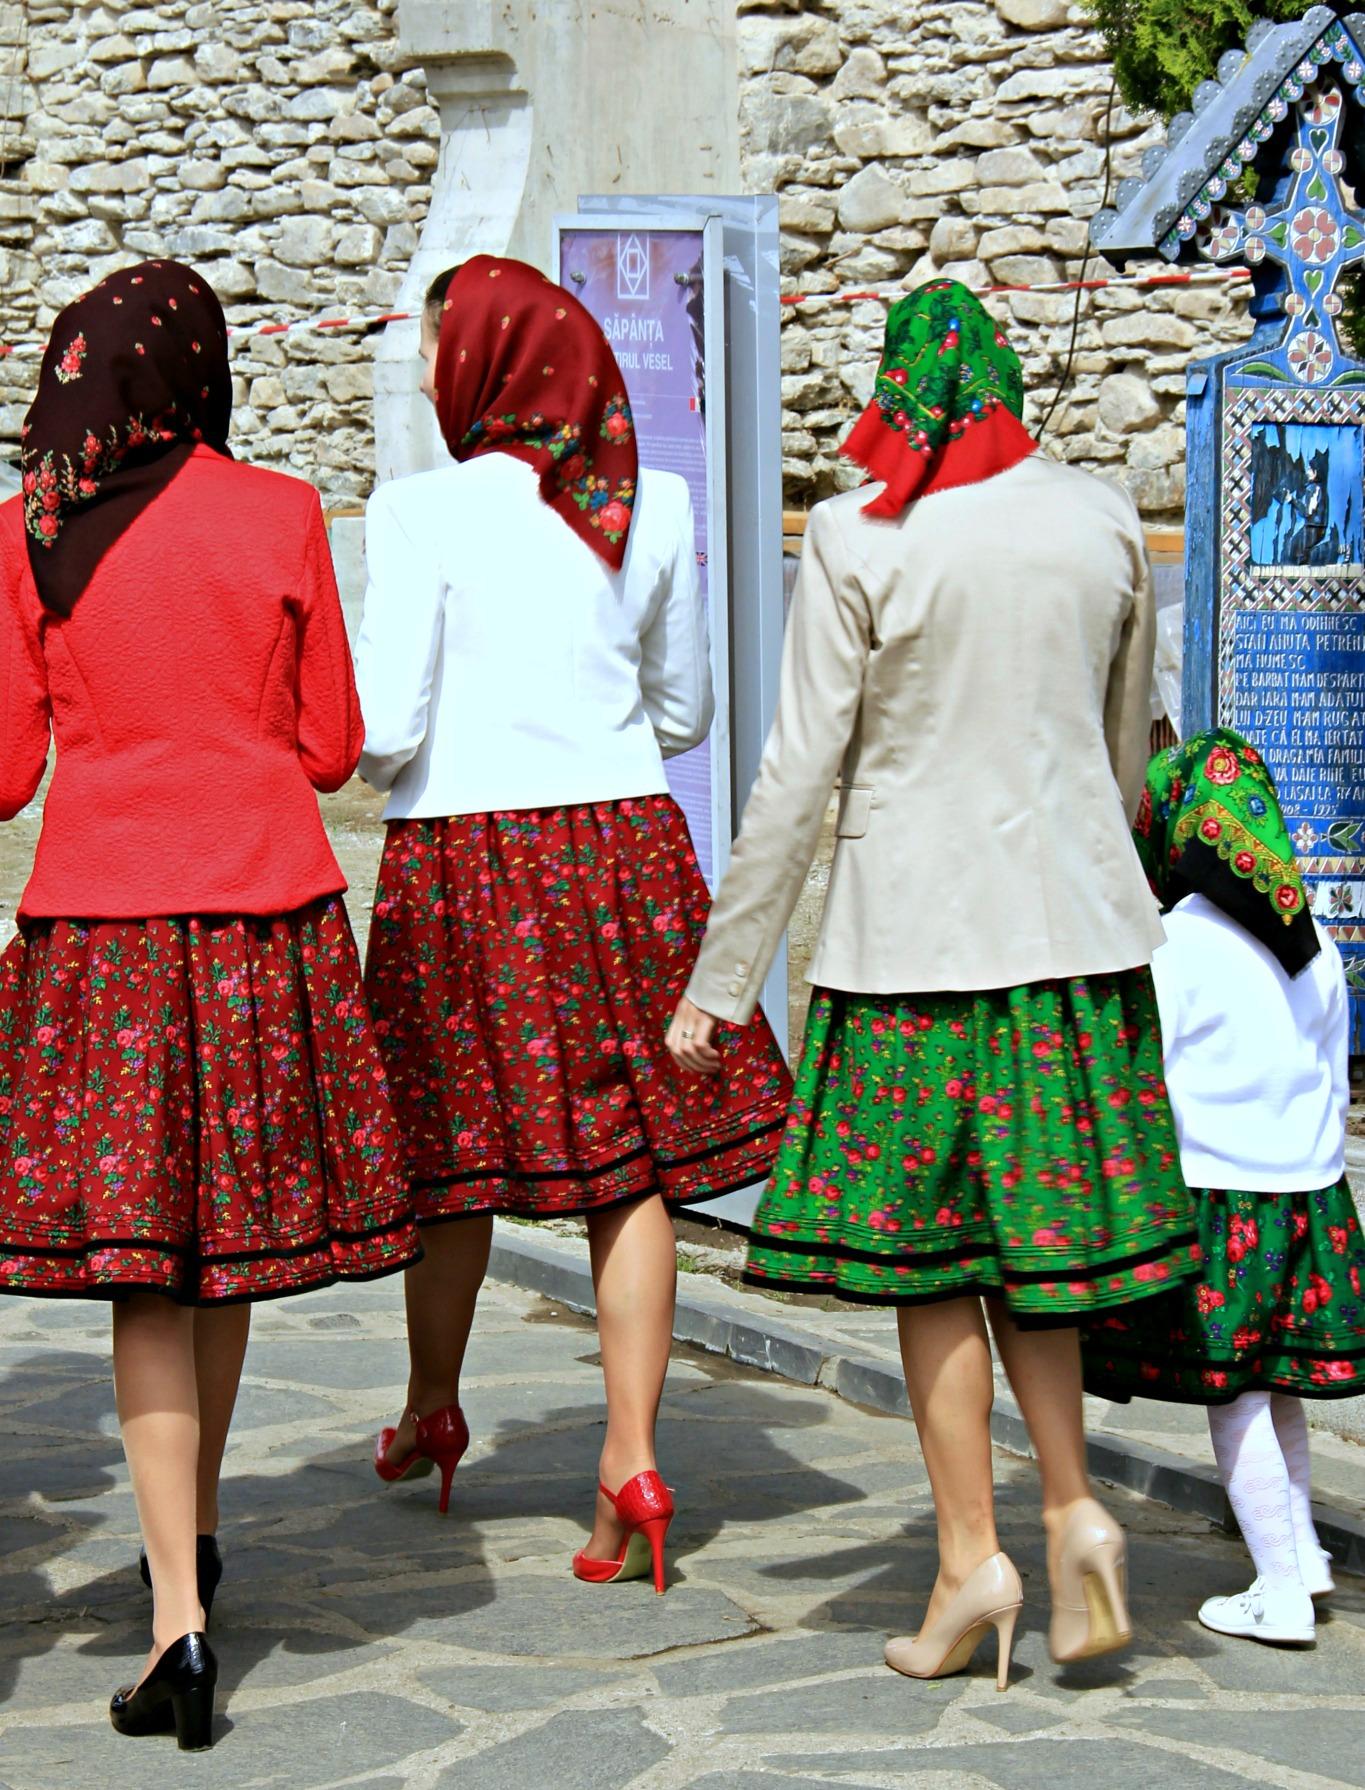 Even the small kids dress traditionally. Photo by Ovidiu Balaj